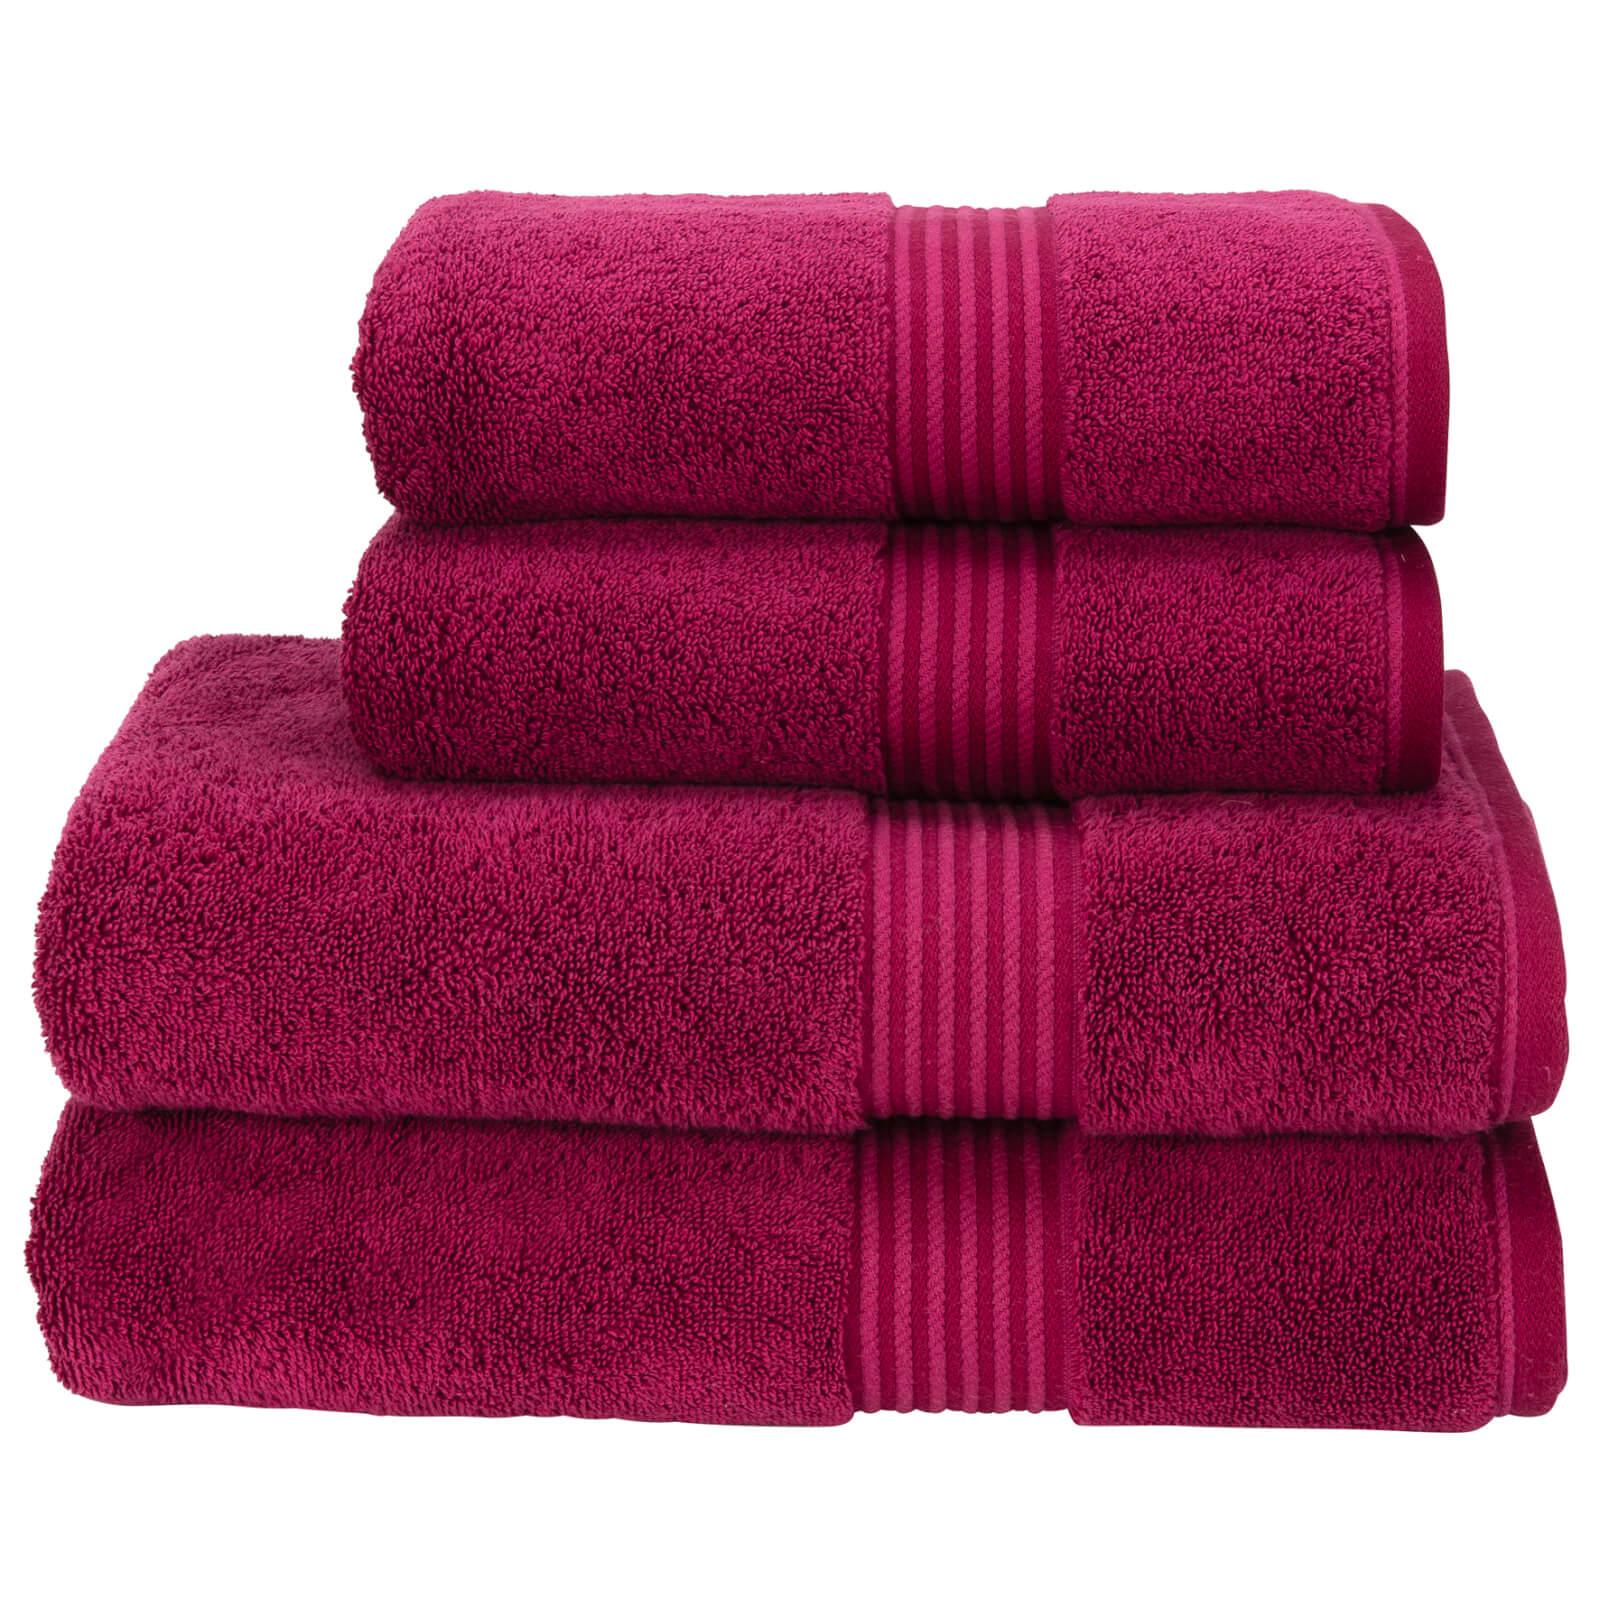 Christy Supreme Hygro Towel Range - Raspberry - Bath Towel (Set of 2) - Pink